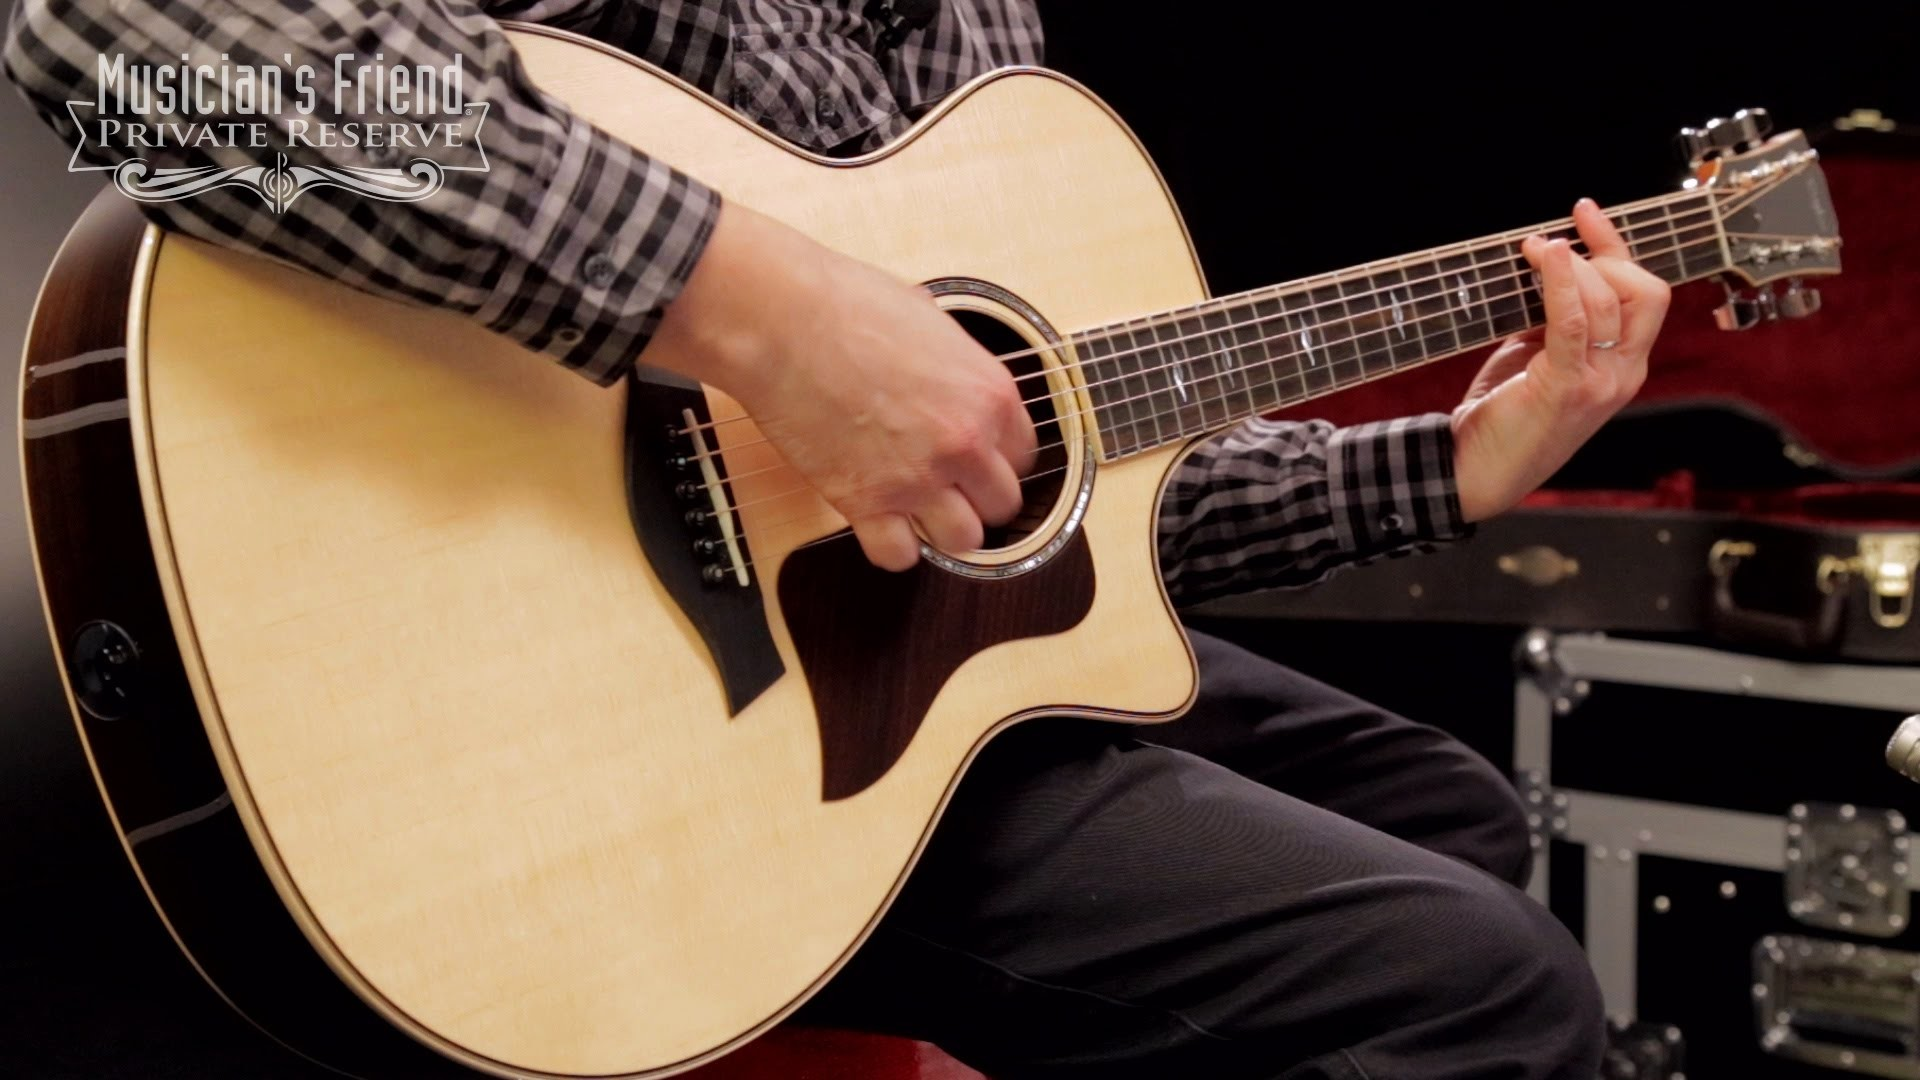 1920x1080 Electric Guitar Wallpapers HD Desktop